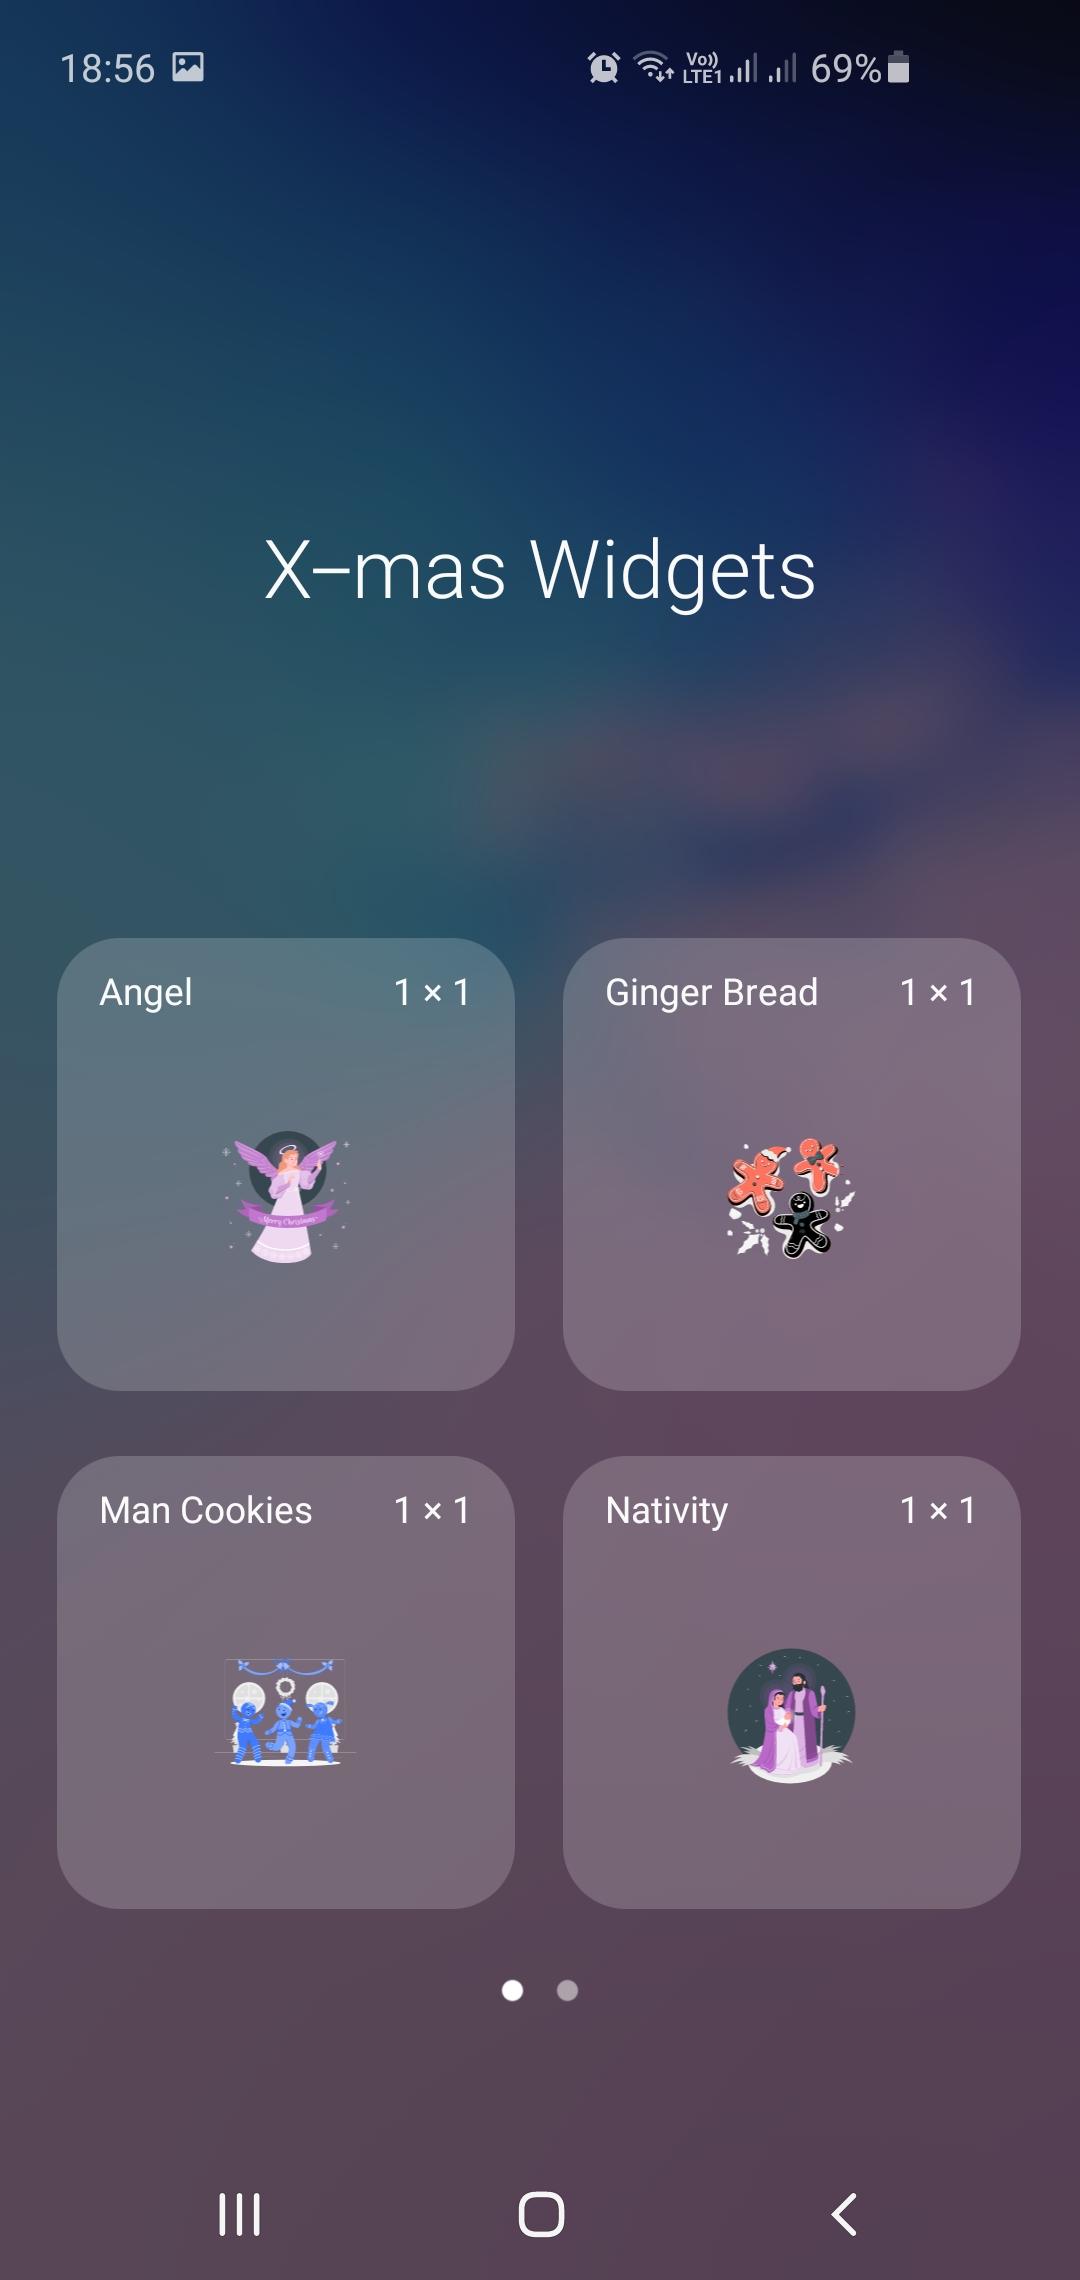 Pepper Xmas Widgets - Animated Widgets